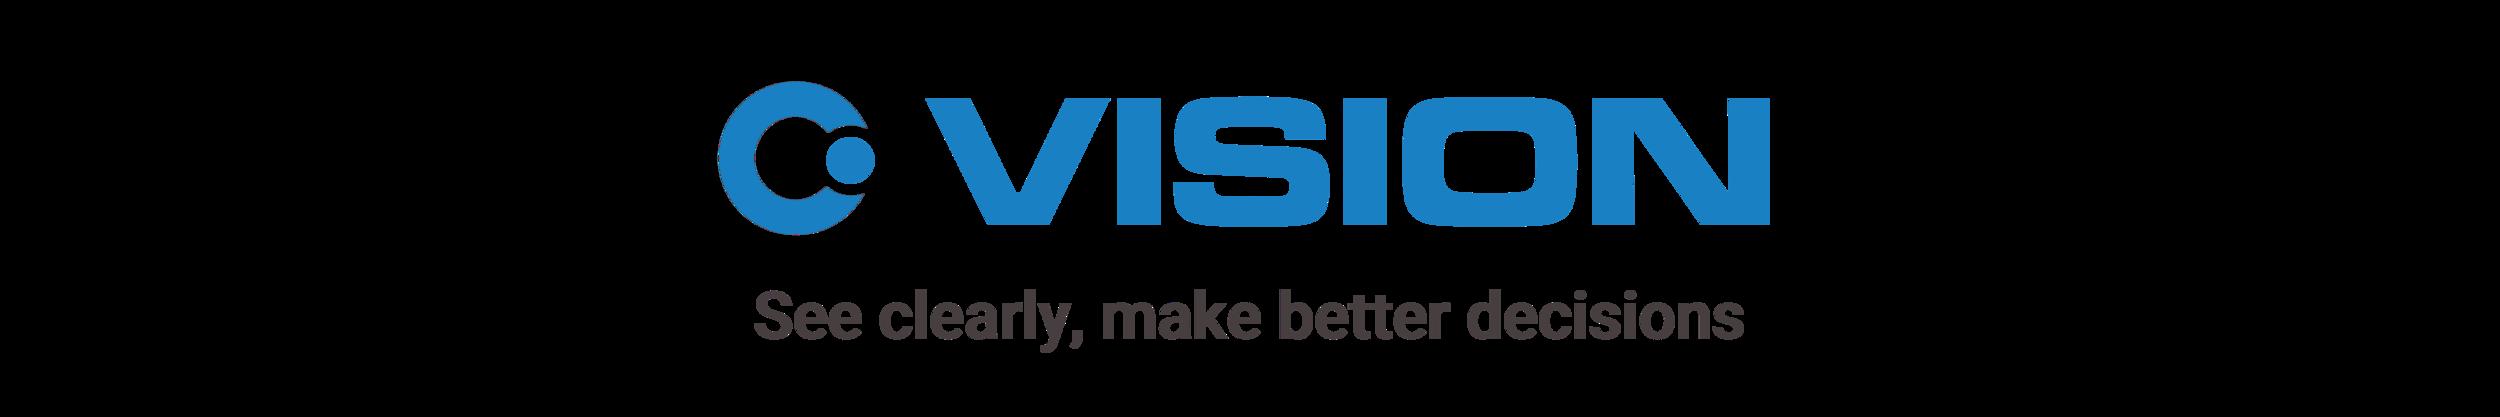 Vision_logo.png